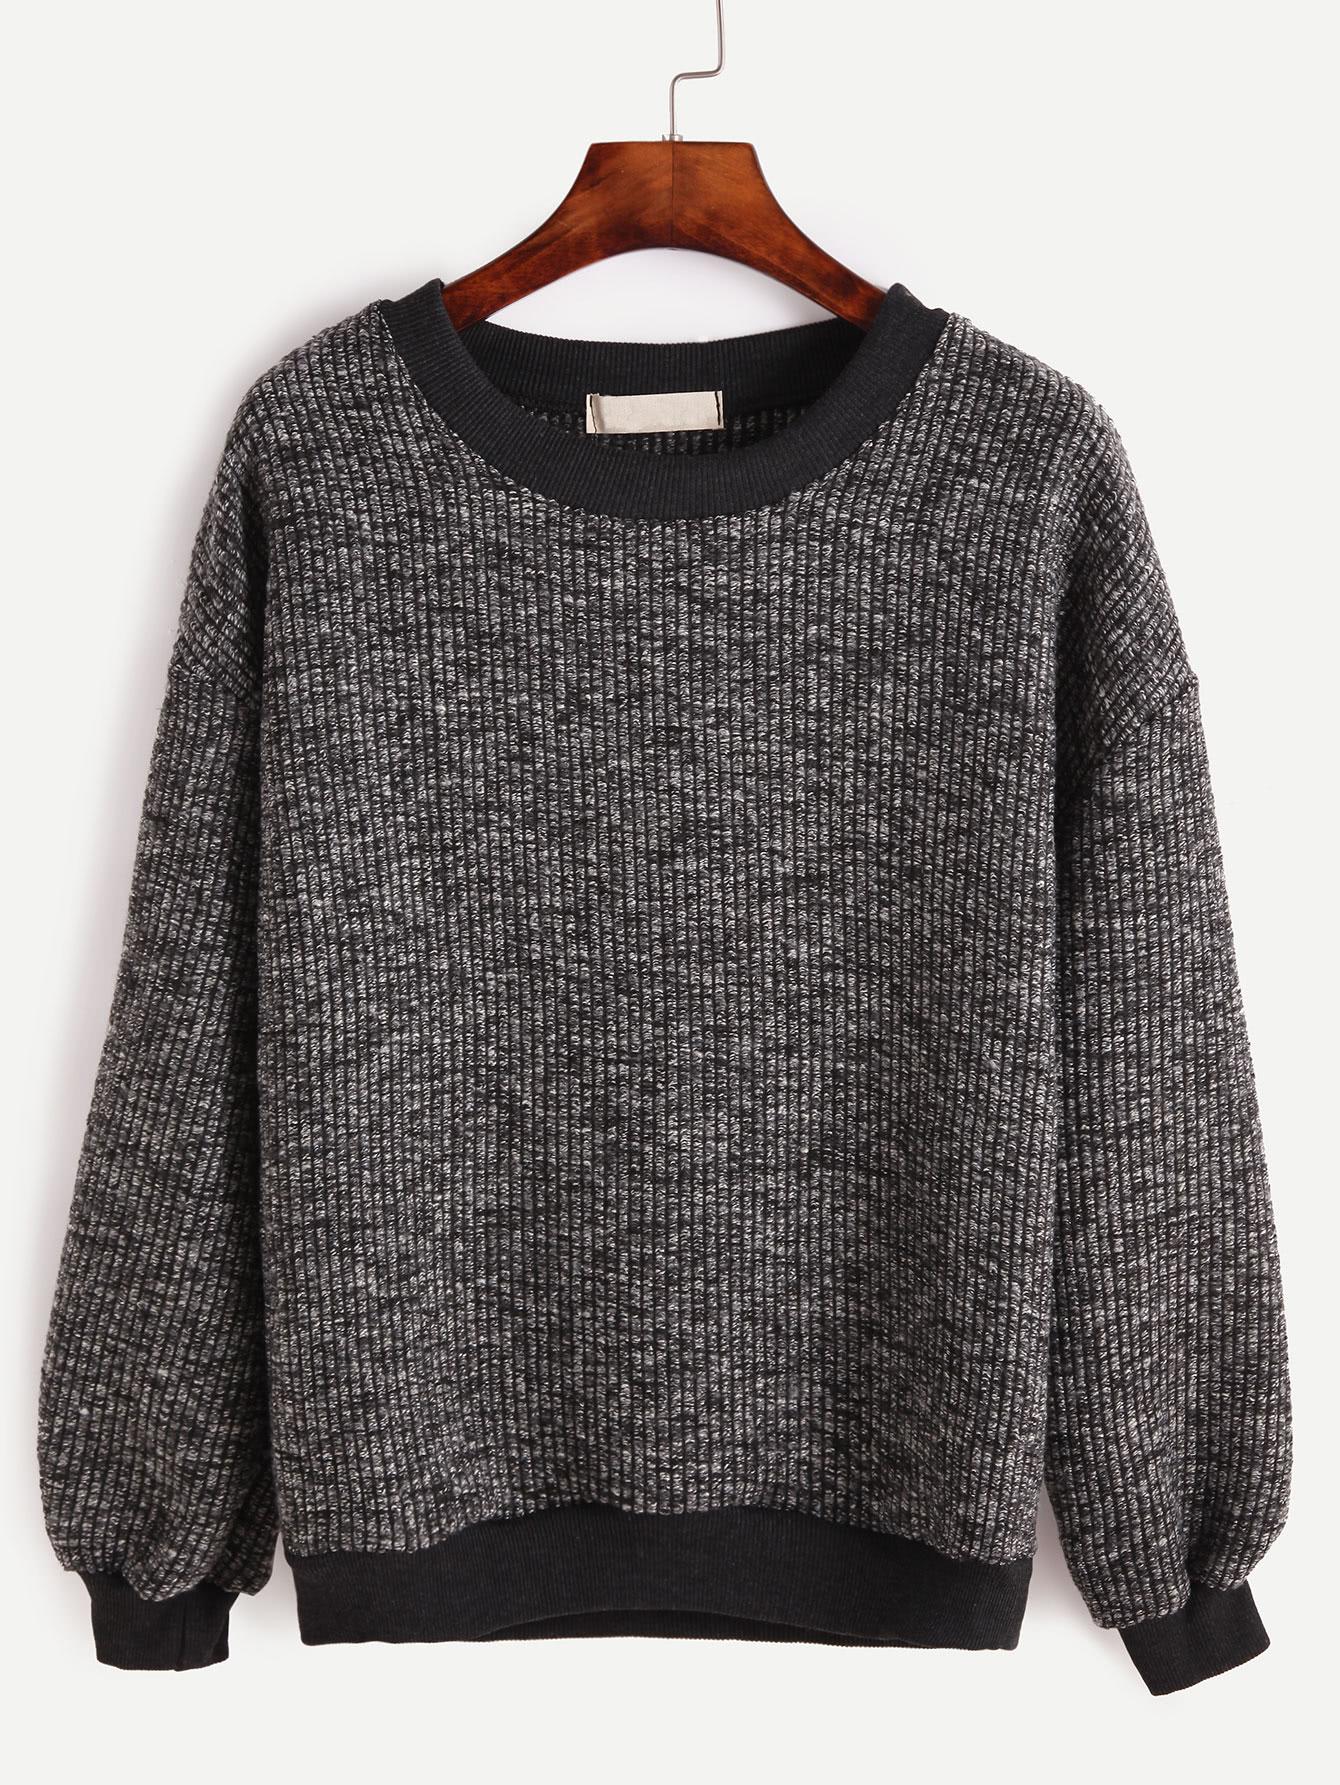 Contrast Trim Ribbed Slub Sweatshirt sweatshirt160921102